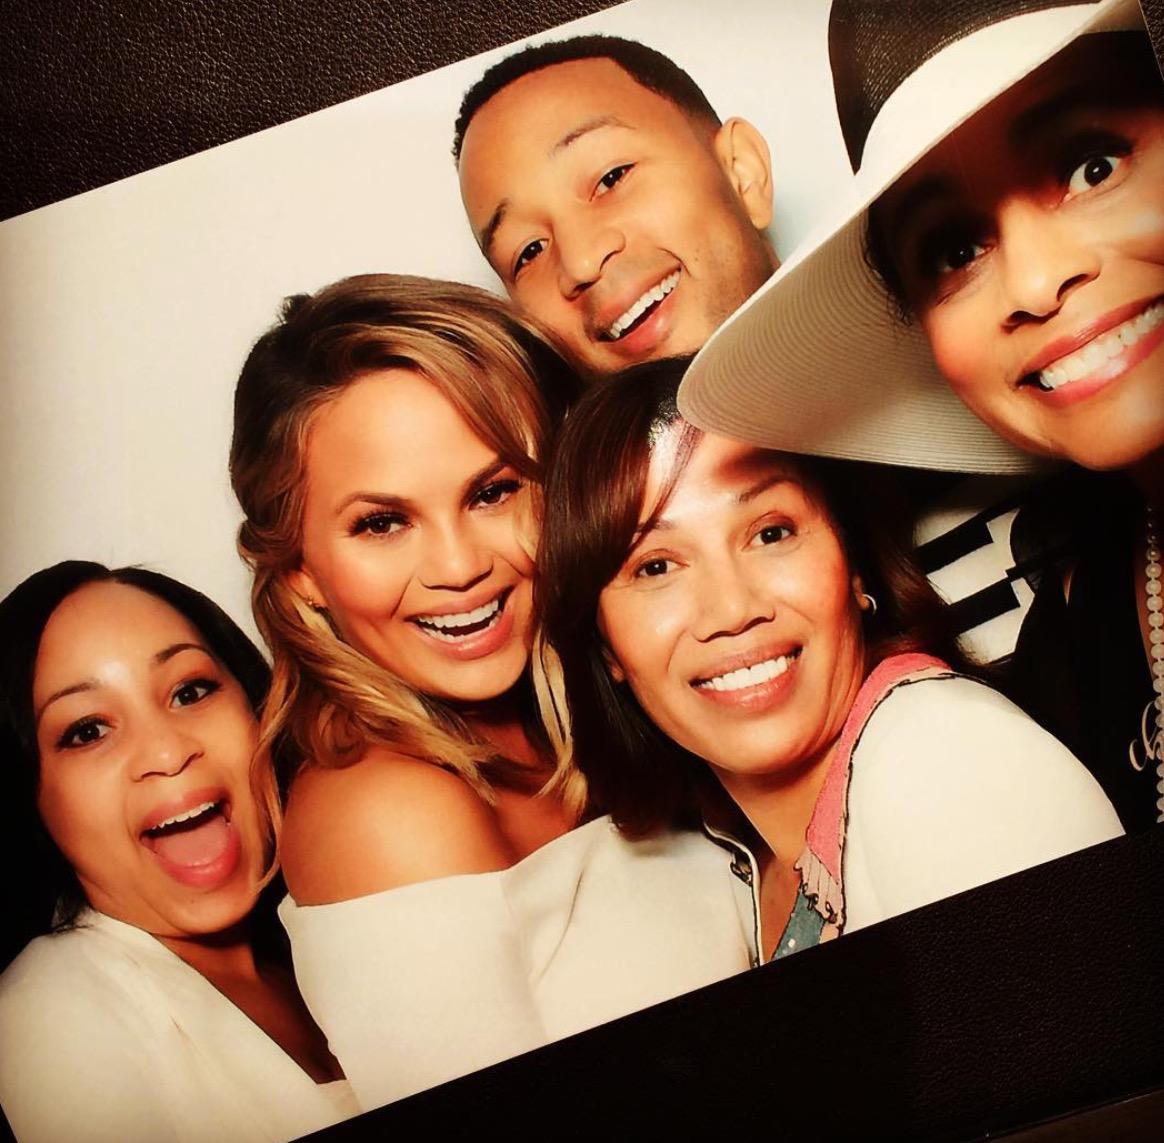 Chrissy Teigen, John Legend and Family At Baby Shower